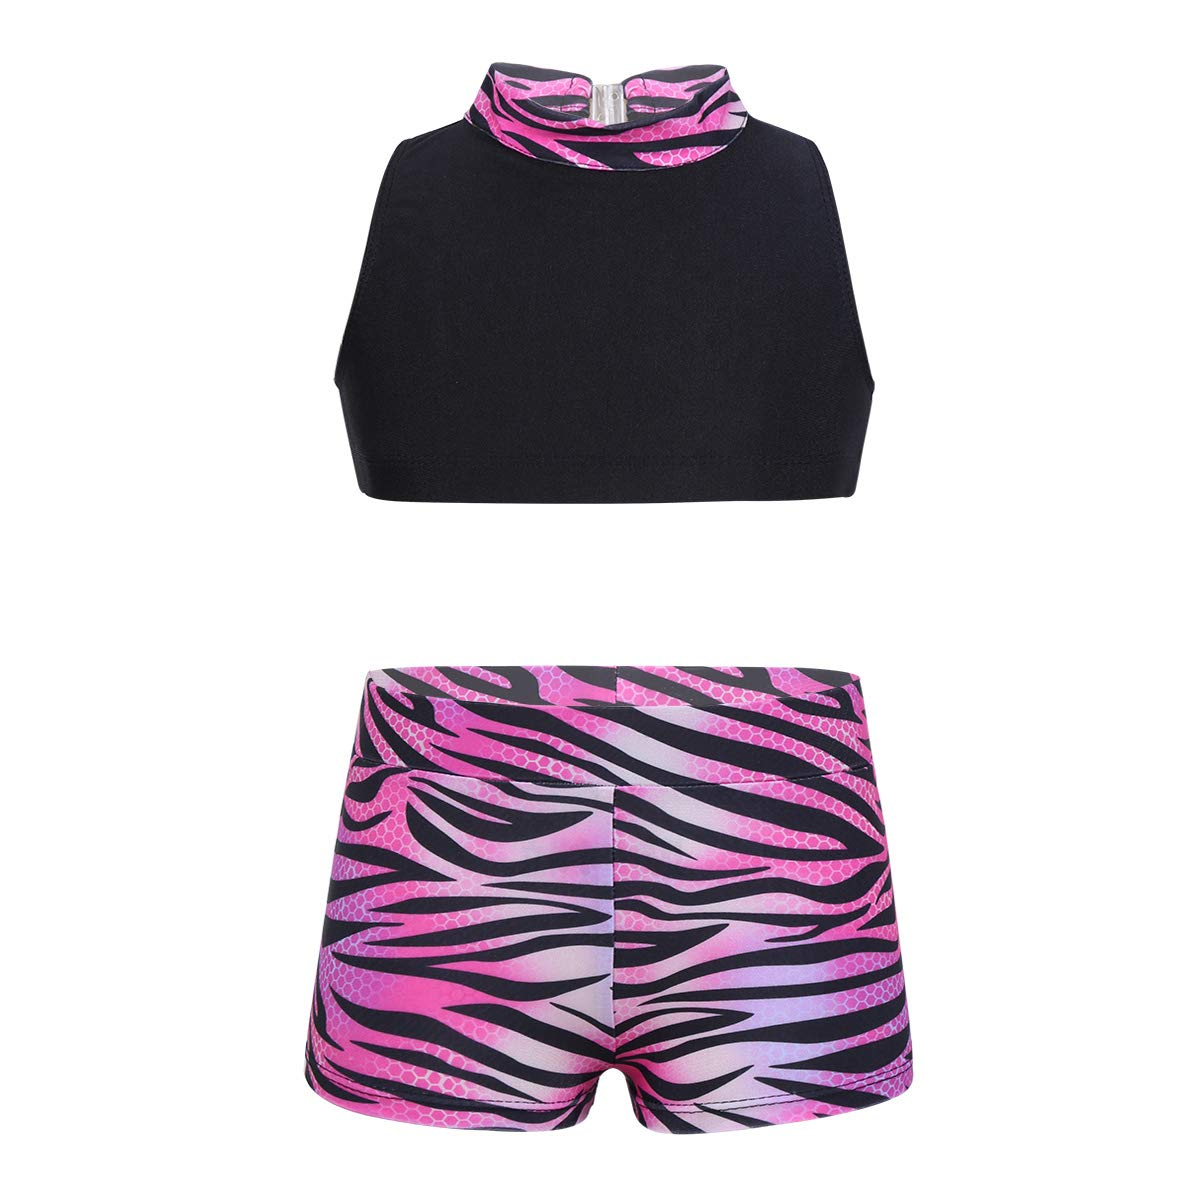 Agoky SOCKSHOSIERY ガールズ B07KYP9YQT 10-12|Rose Red Zebra-stripe Rose Red Zebra-stripe 43750